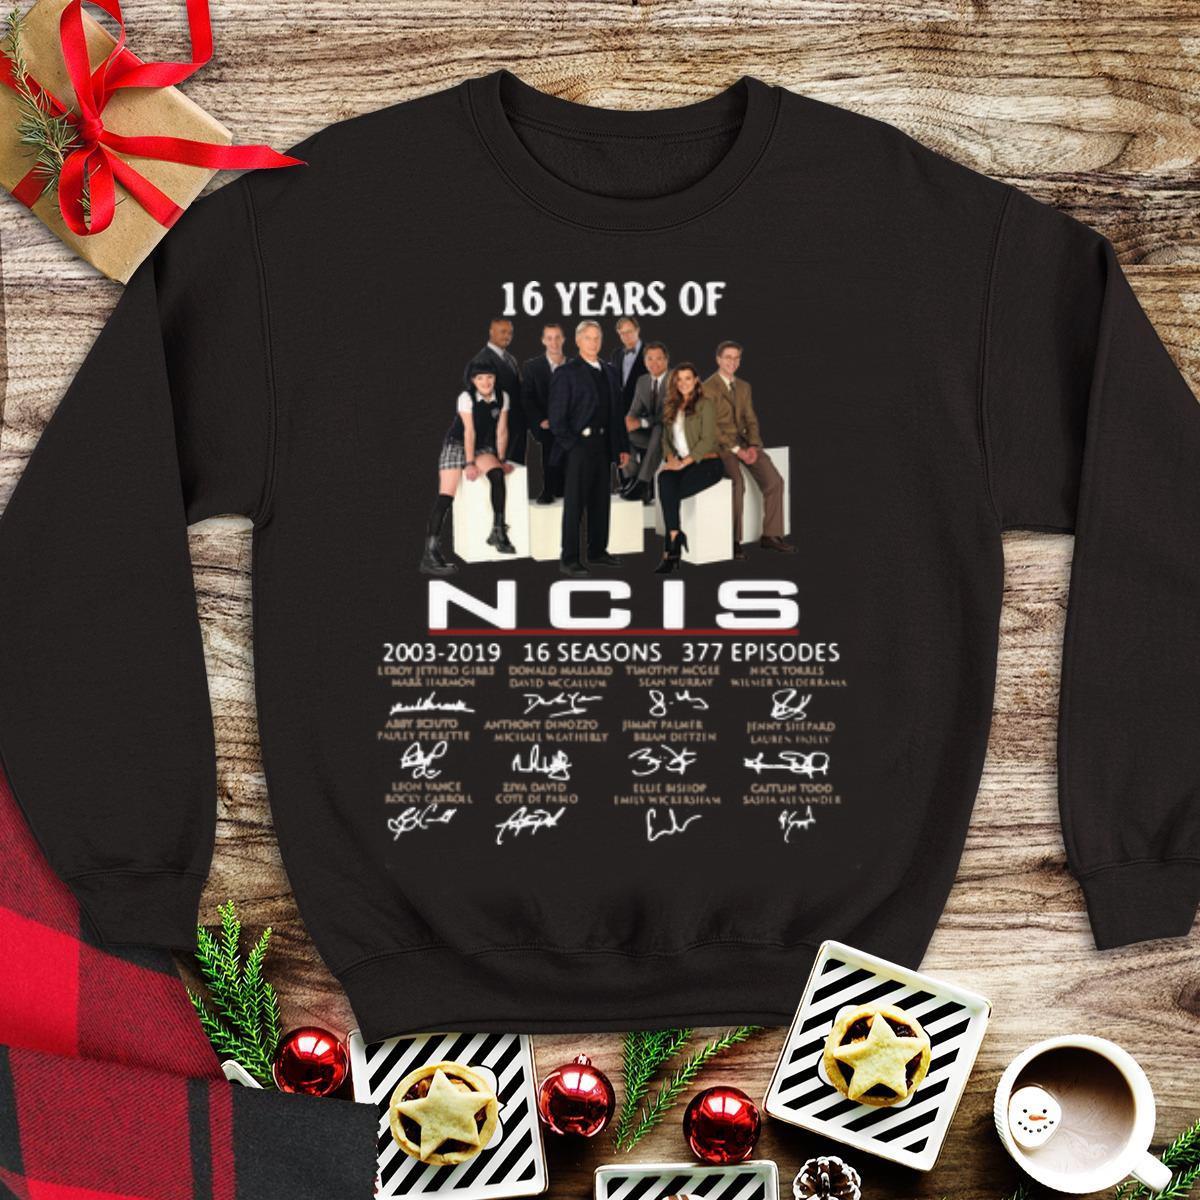 16 Years Of NCIS 2003 2019 16 Seasons 377 Episodes Signature shirt 1 - 16 Years Of NCIS 2003-2019 16 Seasons 377 Episodes Signature shirt